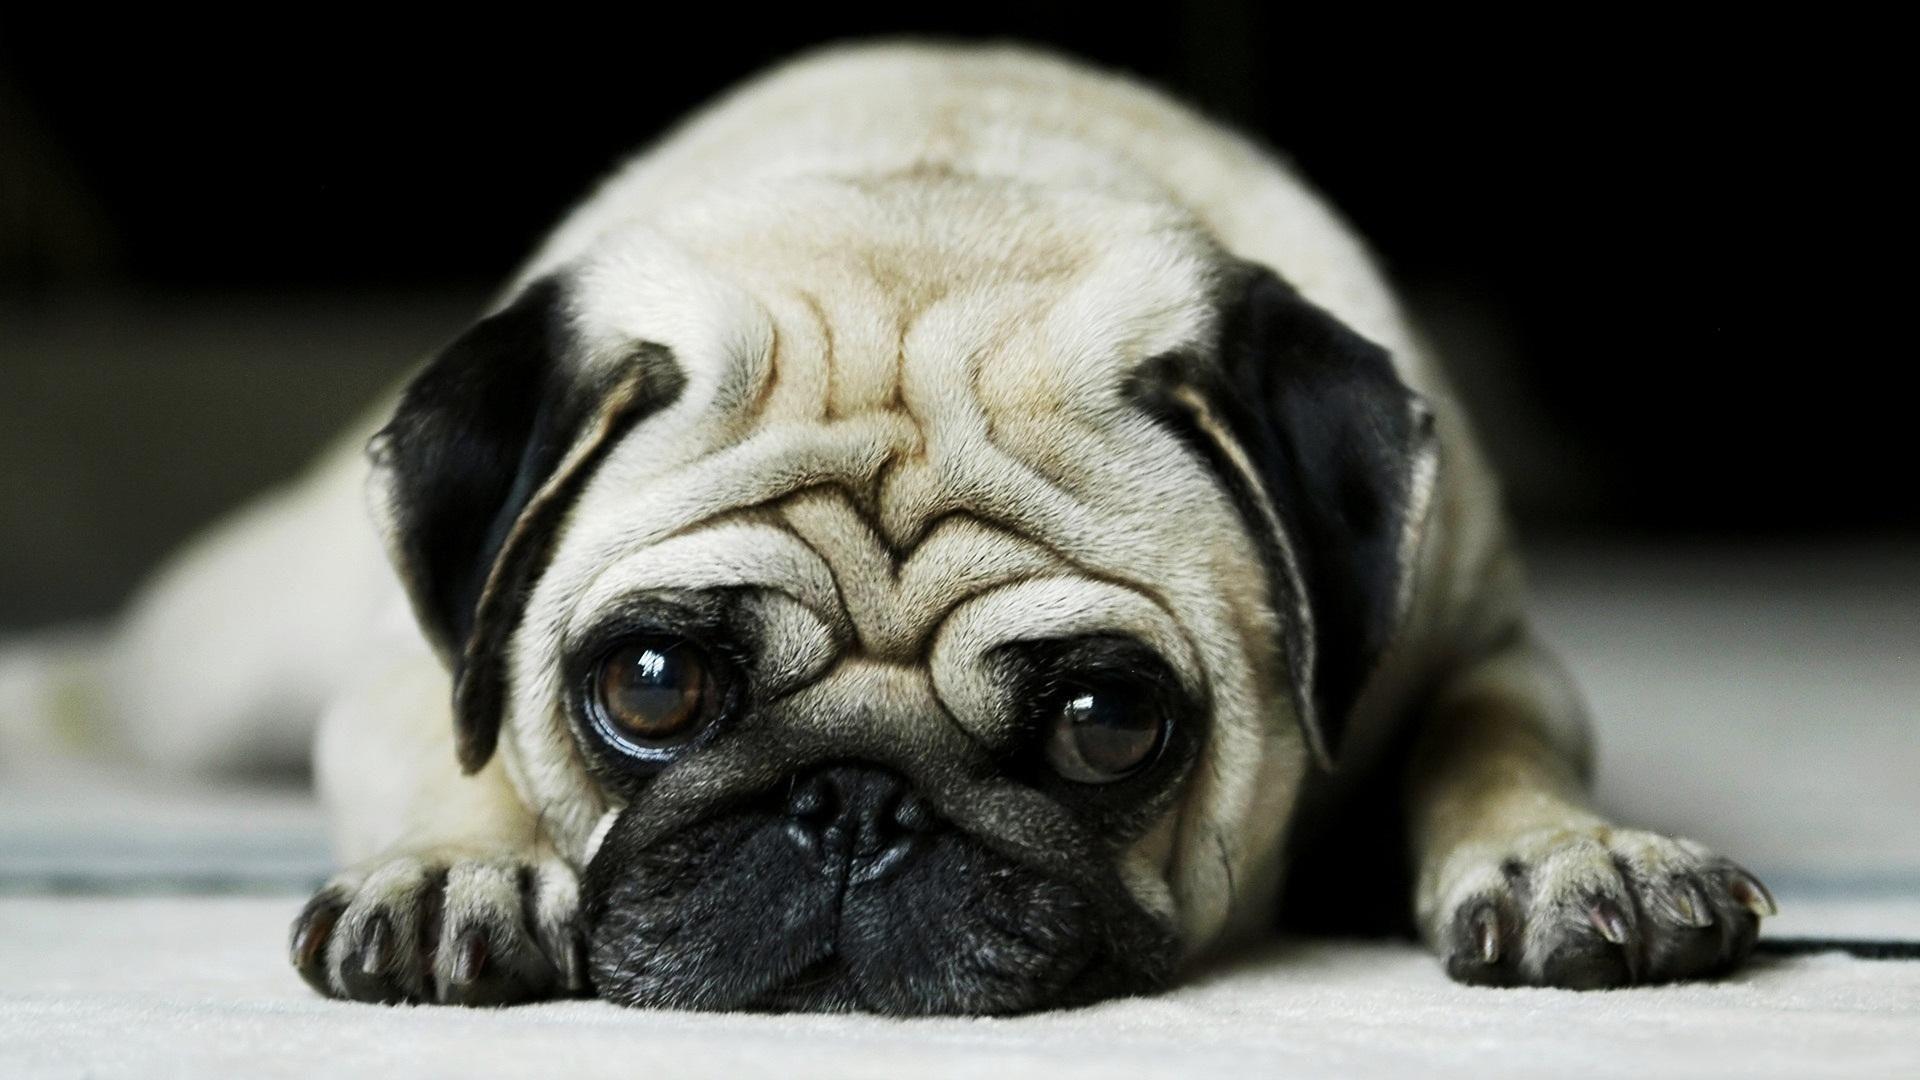 Awesome Pug Puppies Wallpaper Desktop Pug Wallpaper Pugs Cute Pugs